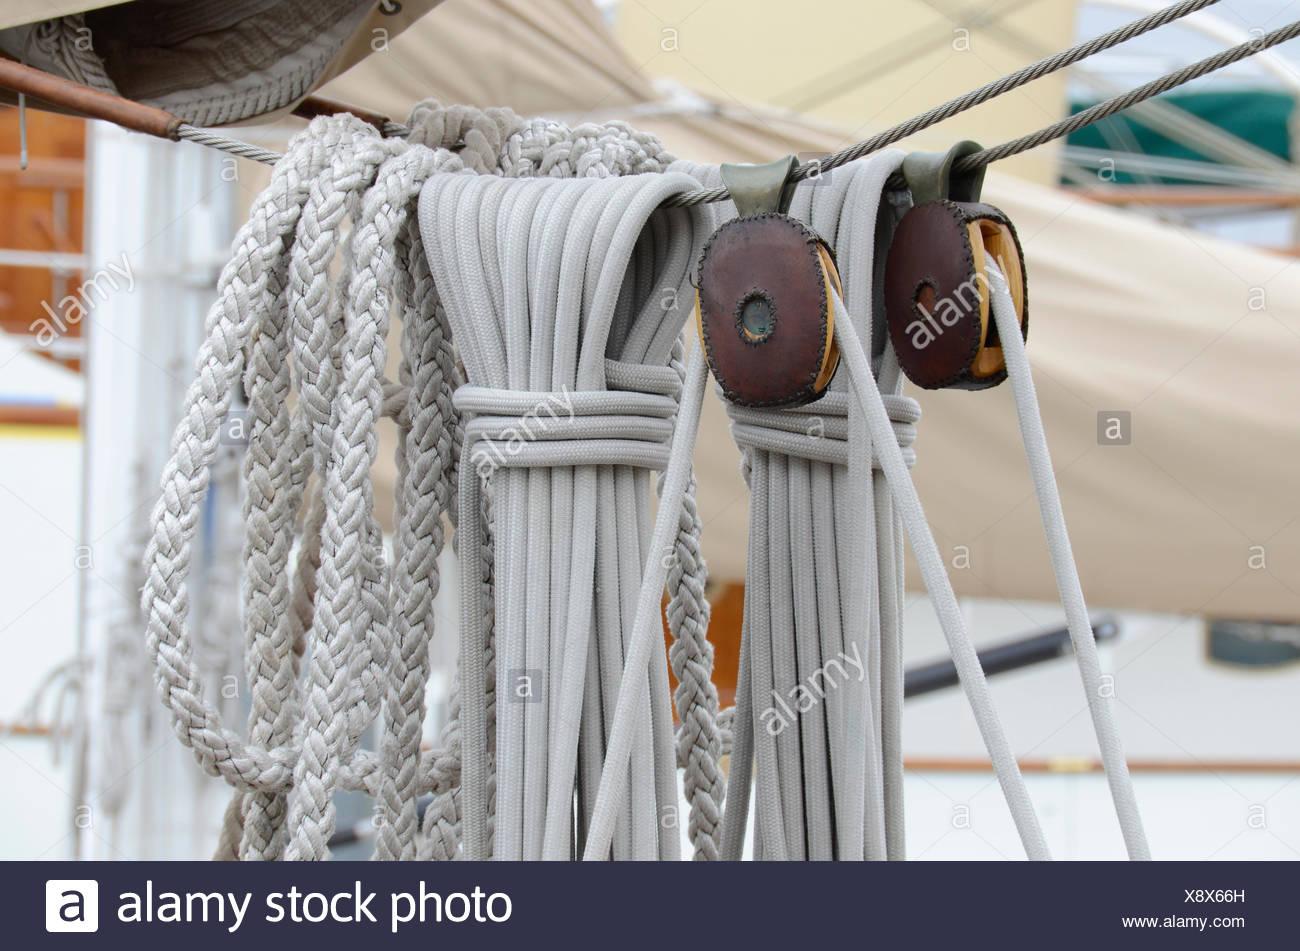 hardware, wood, leather, ropes, boating, pulley, hardware